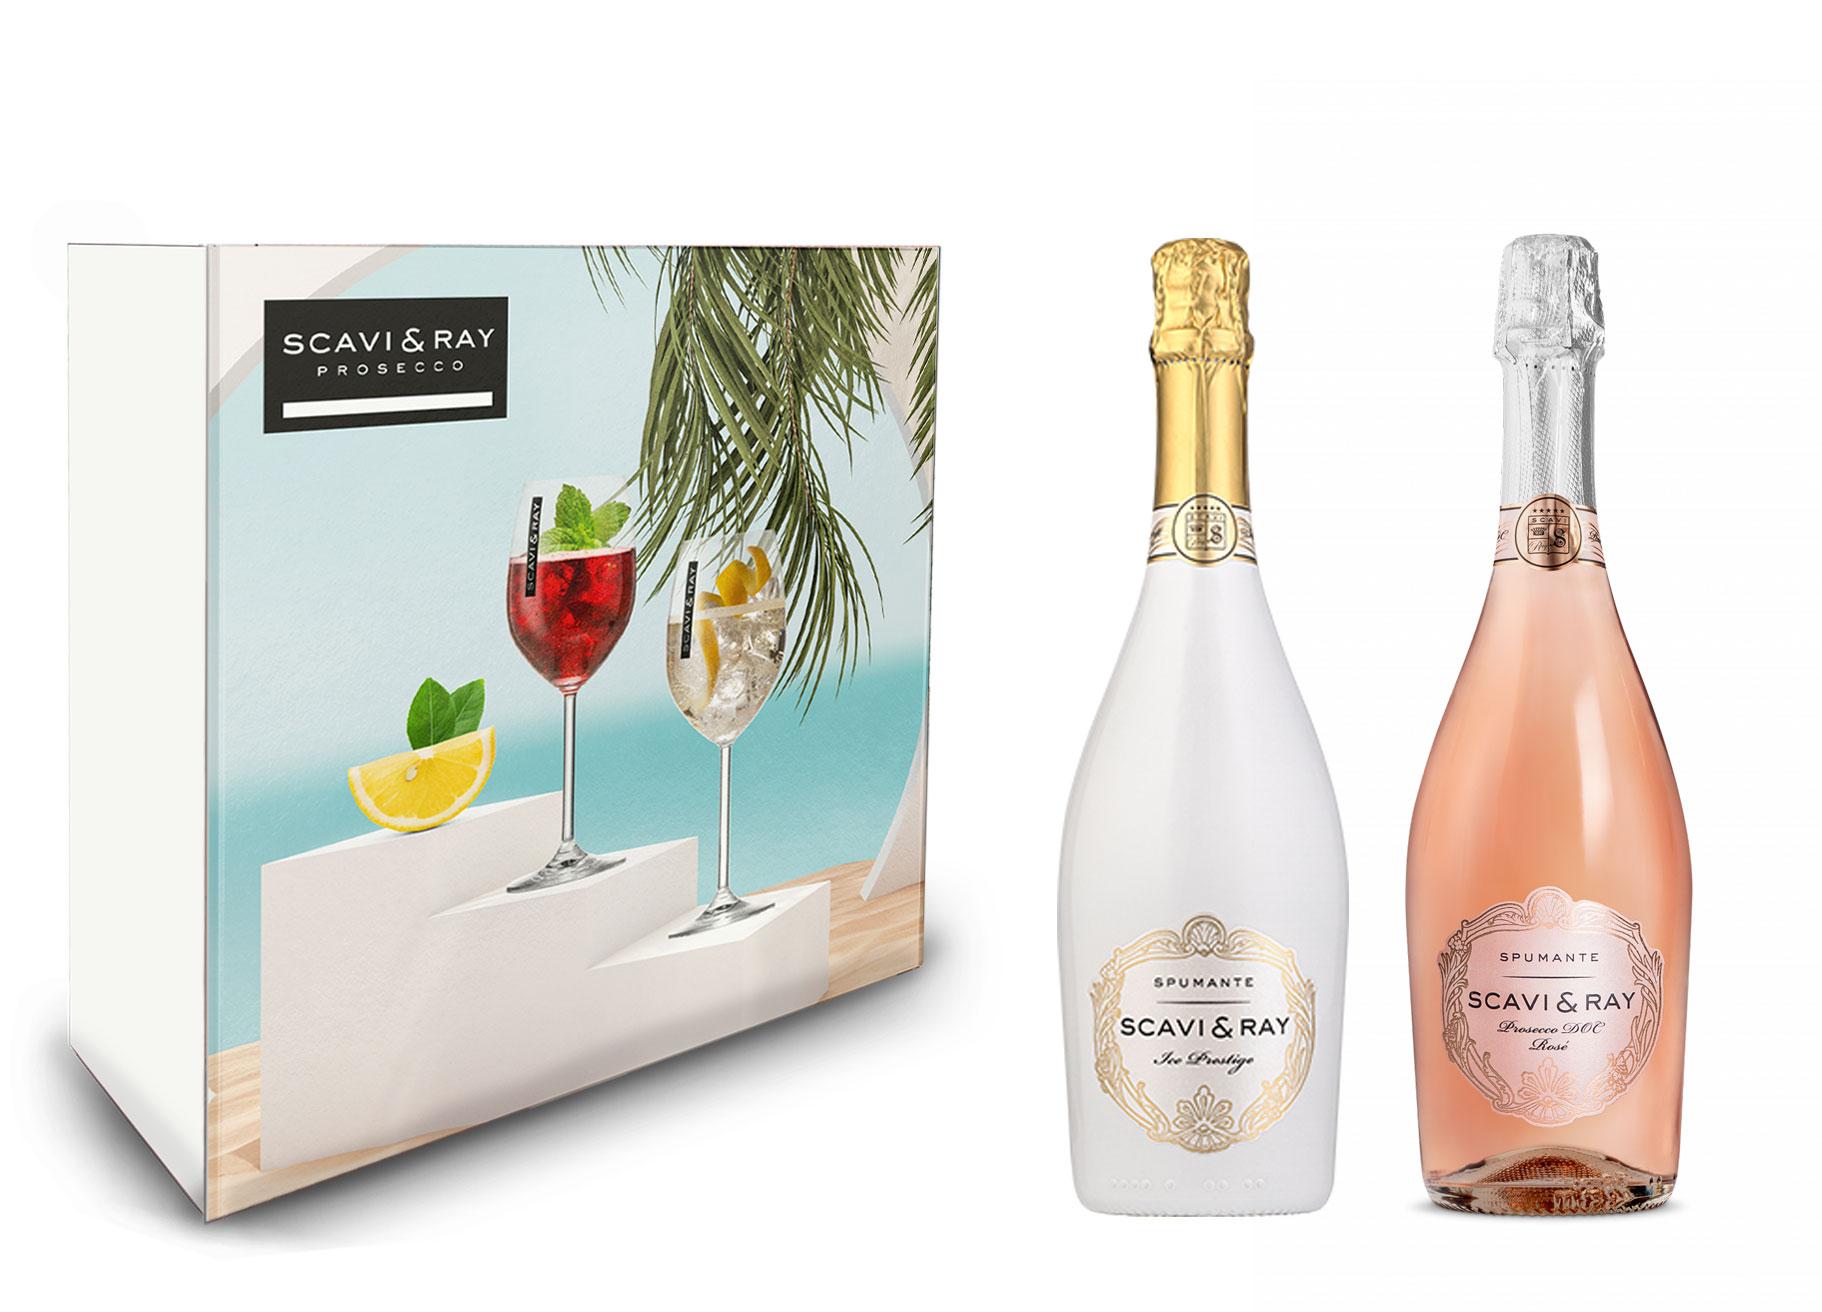 Scavi & Ray Geschenkset Scavi Ray ICE Prestige 0,75l (12% Vol) + Rosé Spumante DOC 0,75L (11% Vol)- [Enthält Sulfite]